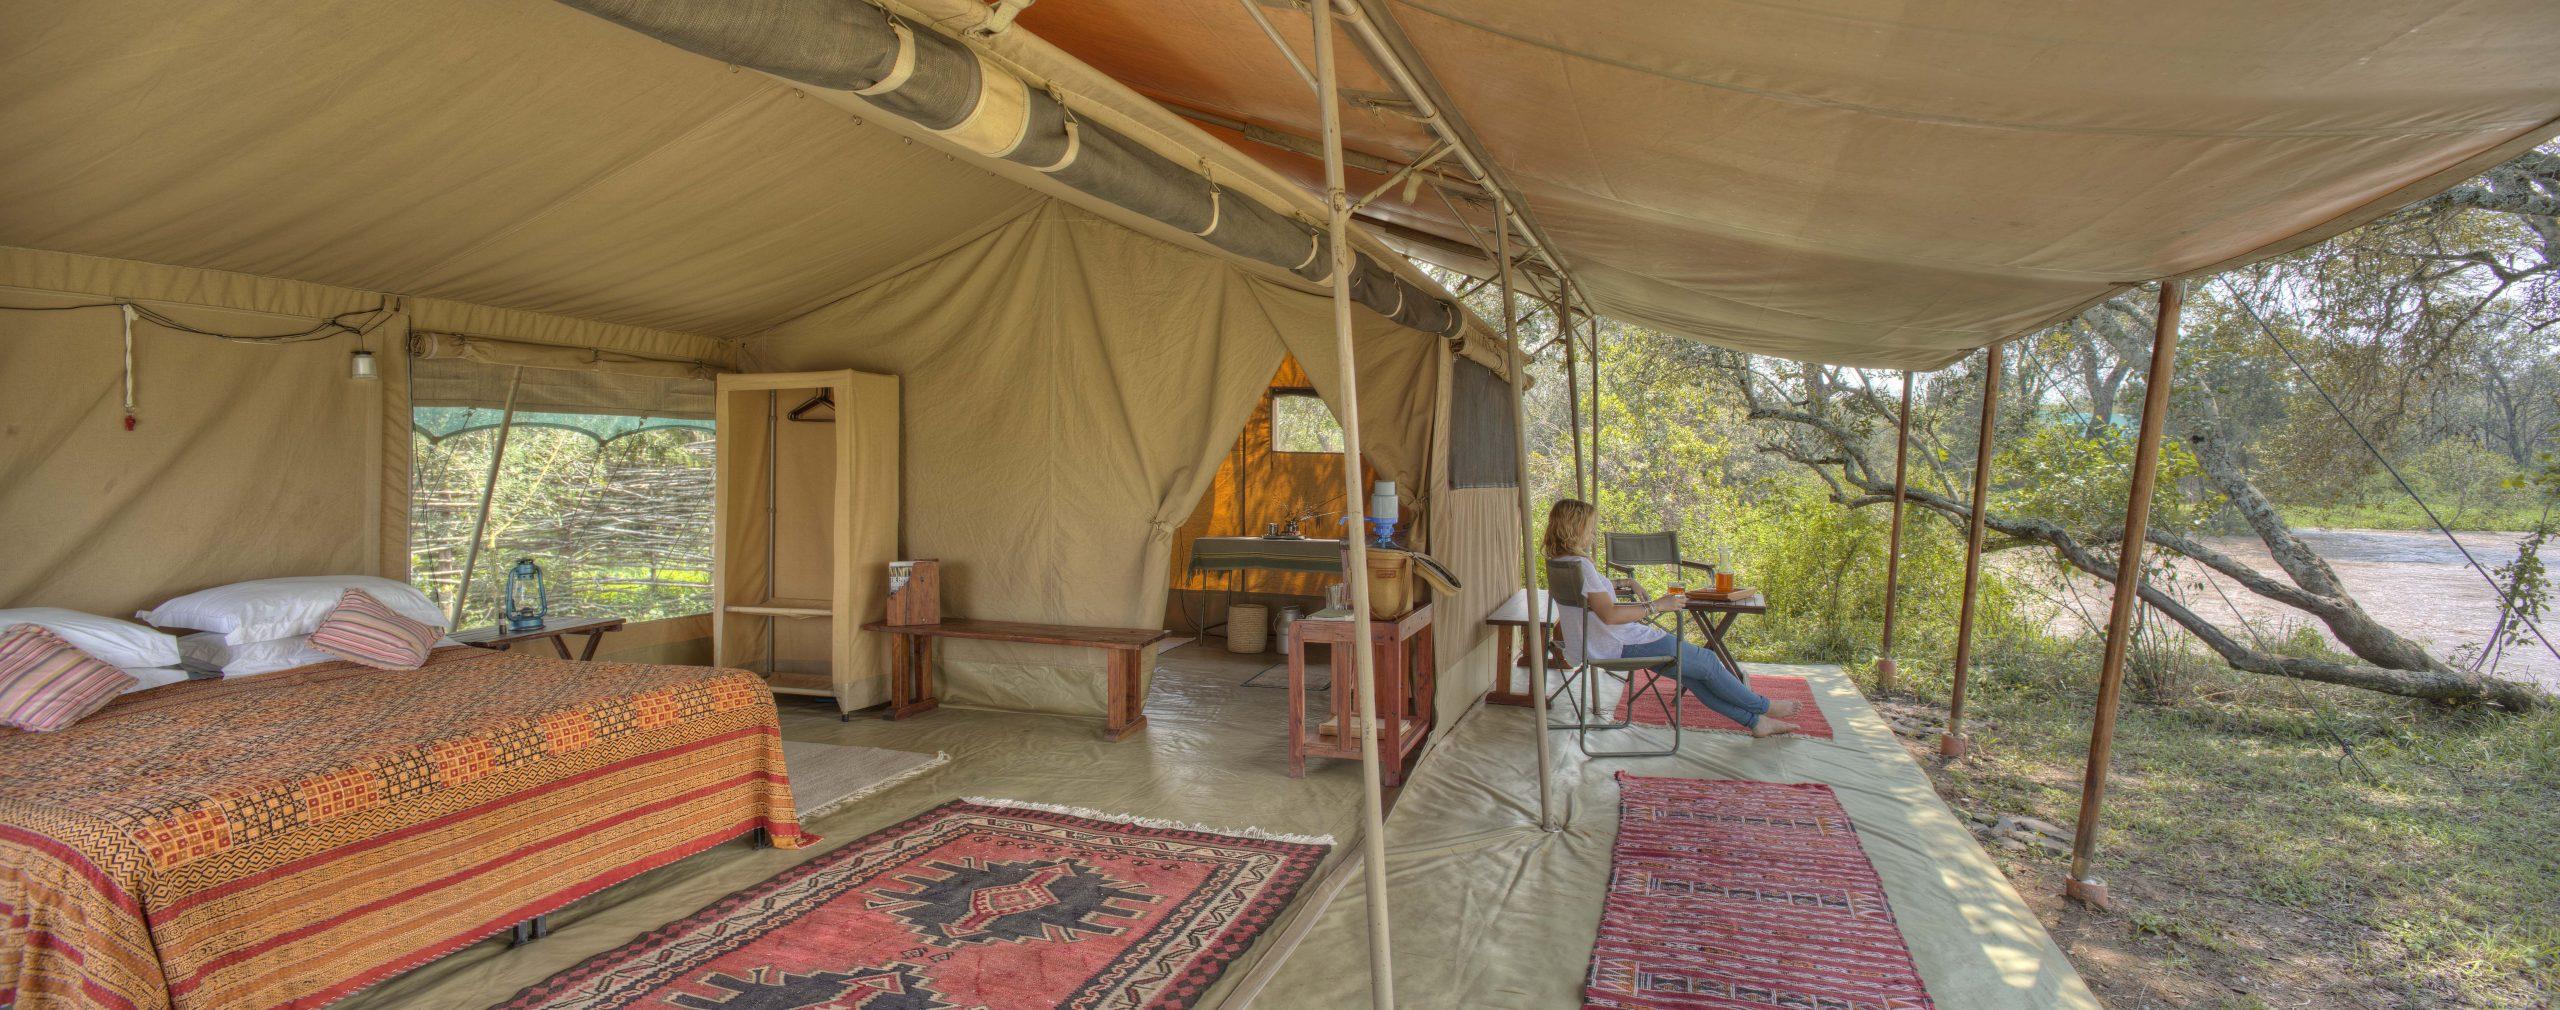 Ol Pejeta Bush Camp tent - Asilia